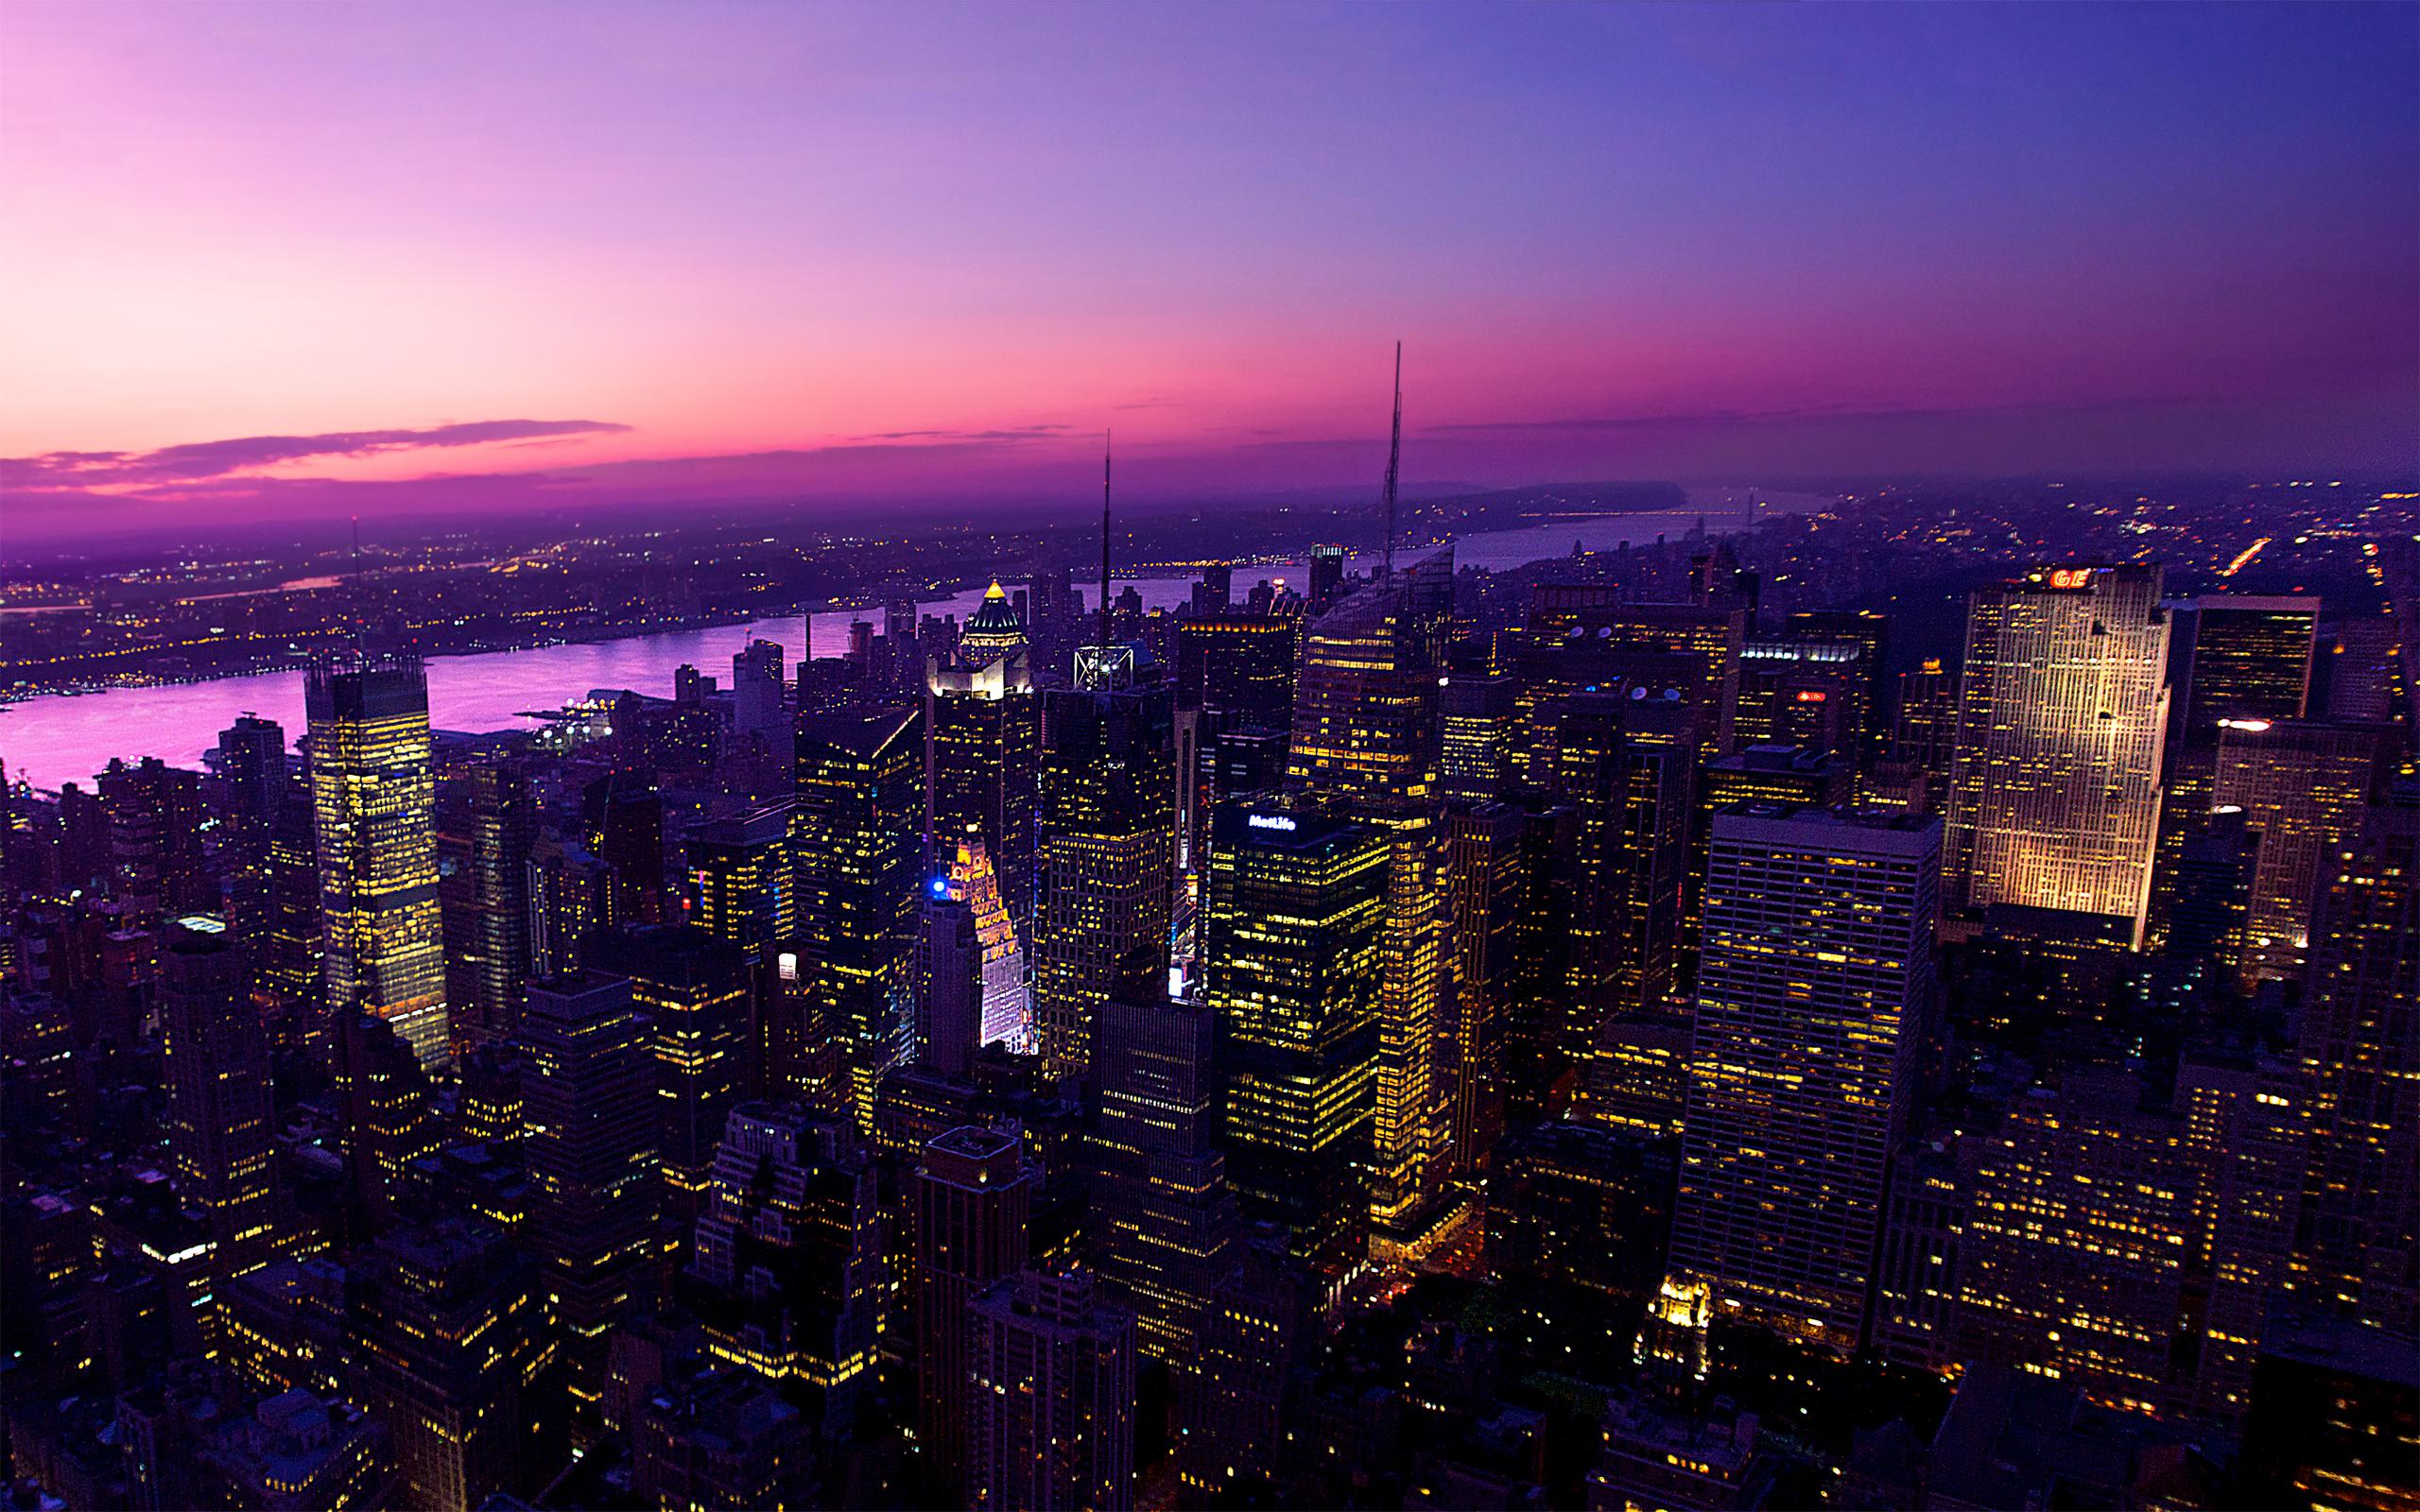 New York Screensaver And Wallpaper